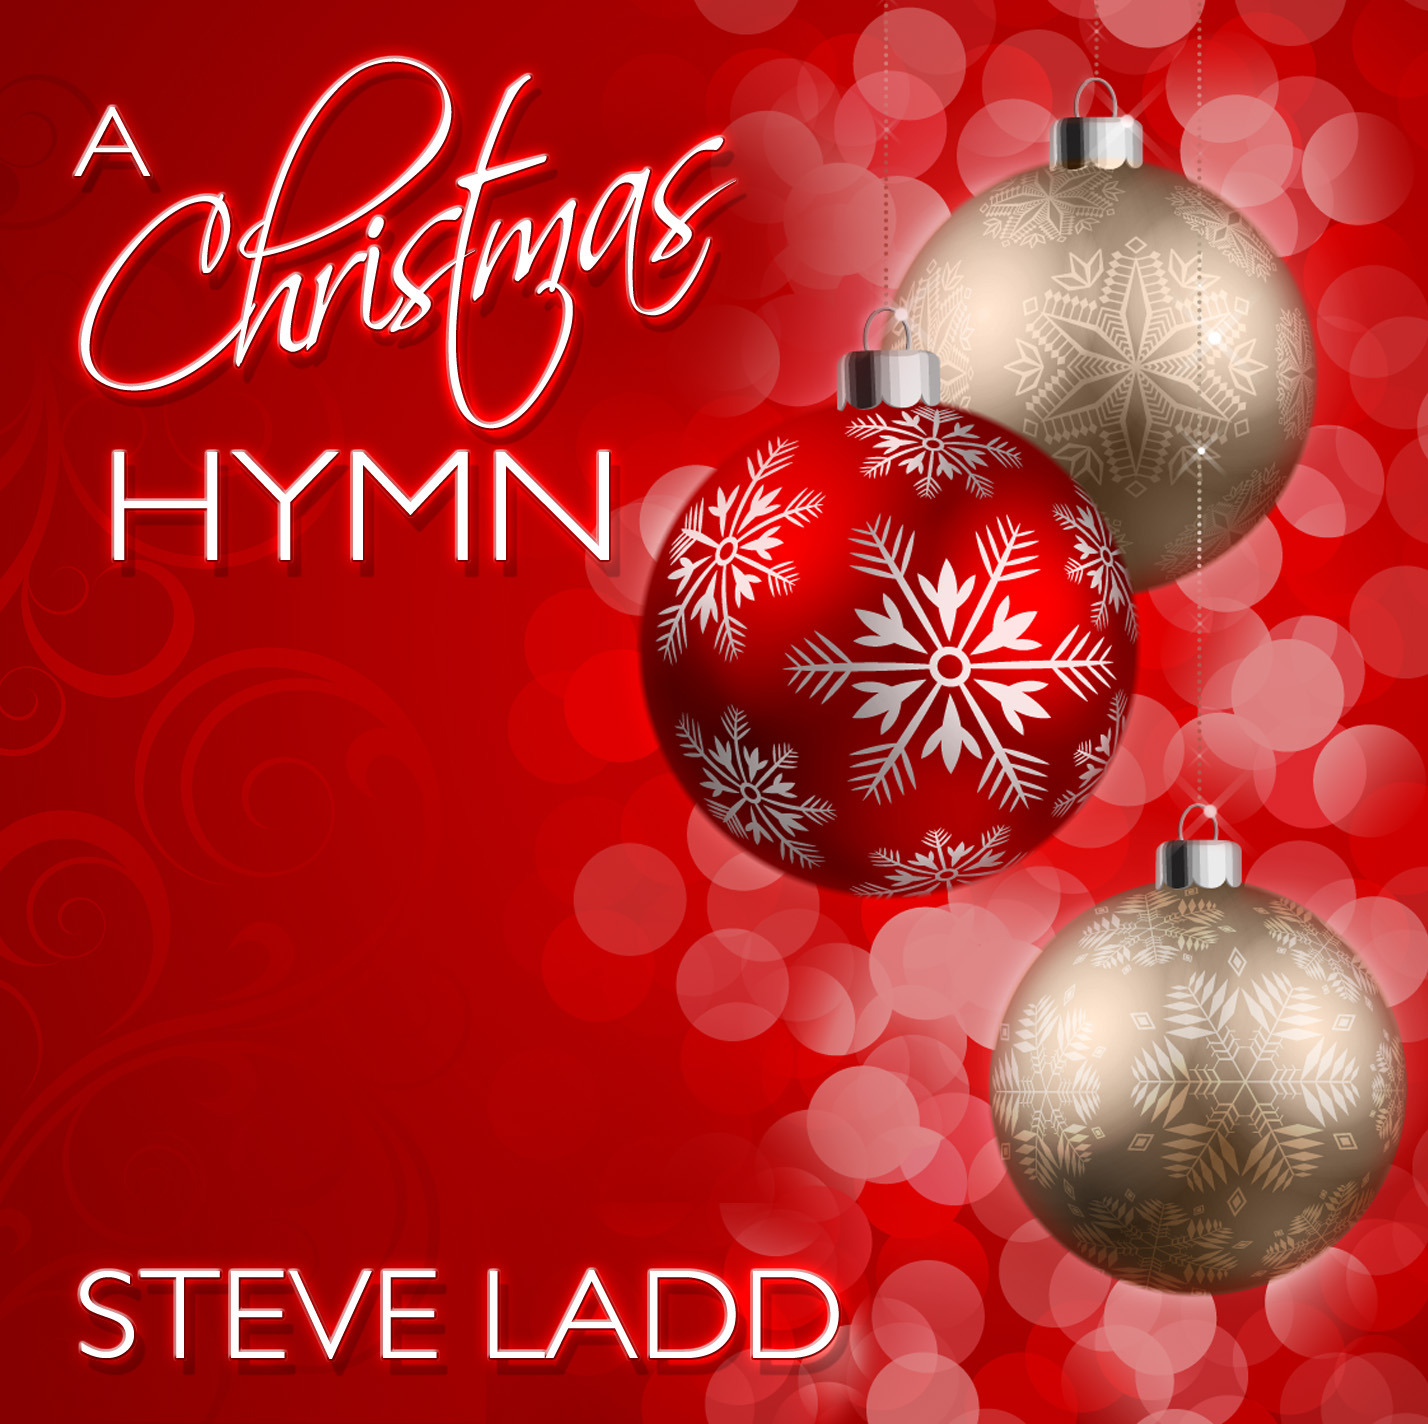 A Christmas Hymn CD